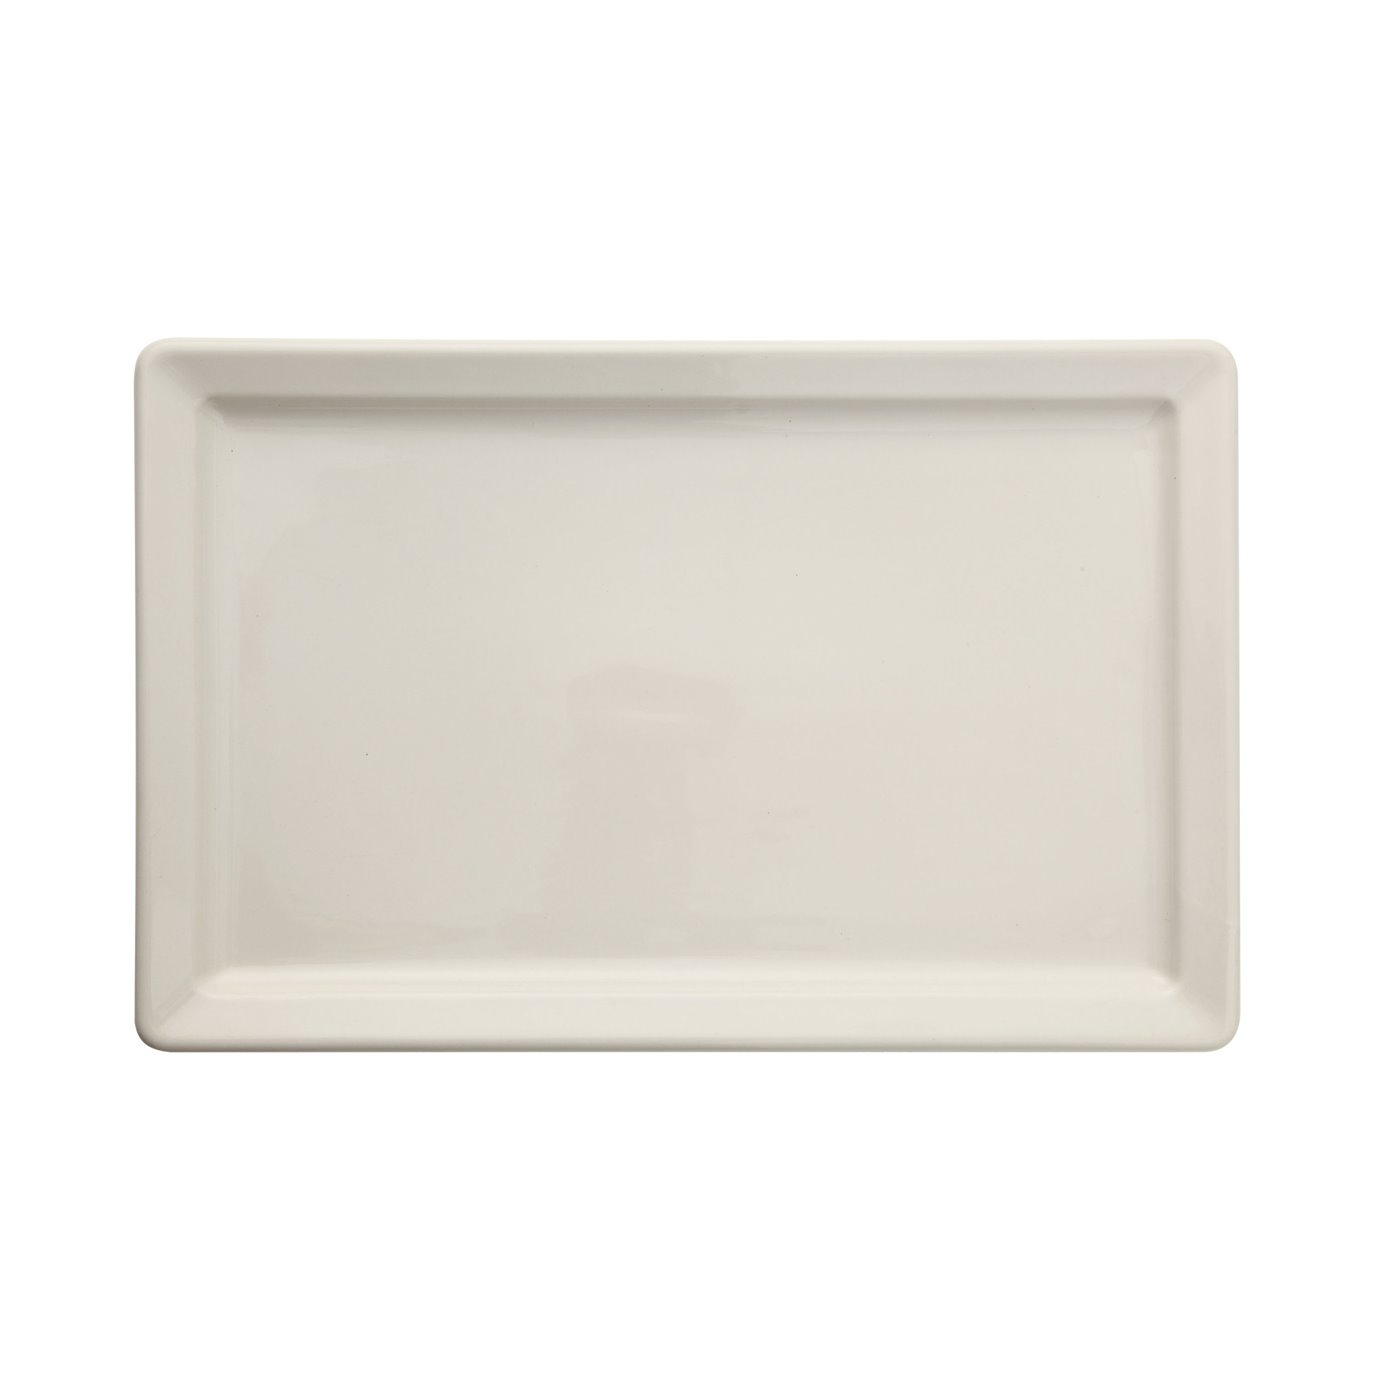 Large Antique White Vintage Reproduction Rectangle Stoneware Platter